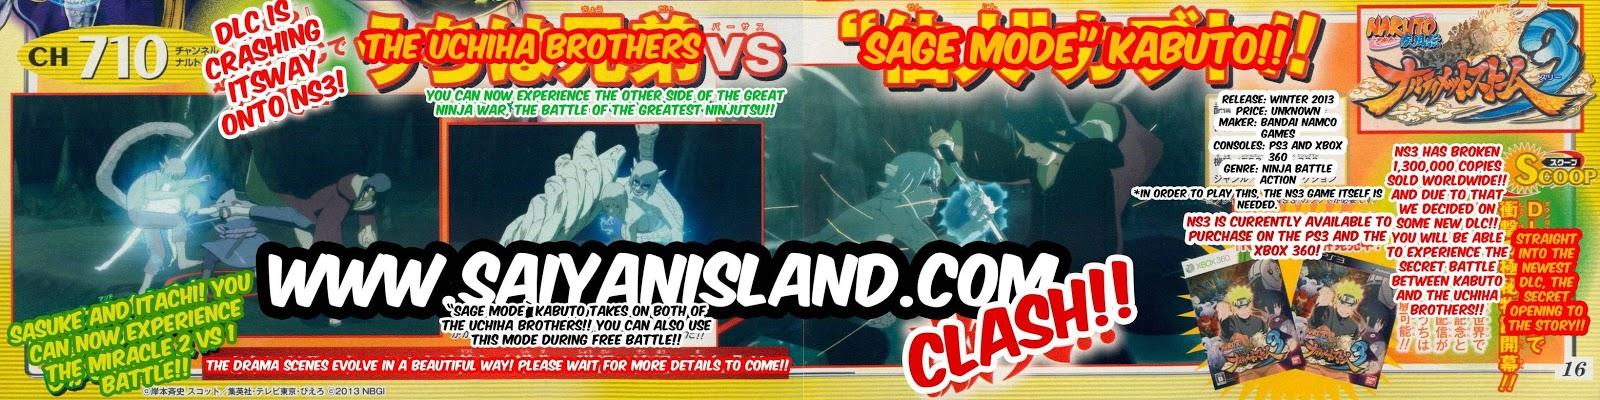 Naruto Shippuden : Ultimate Ninja Storm 3, Actu Jeux Video, Jeux Vidéo, CyberConnect2, Namco Bandai,